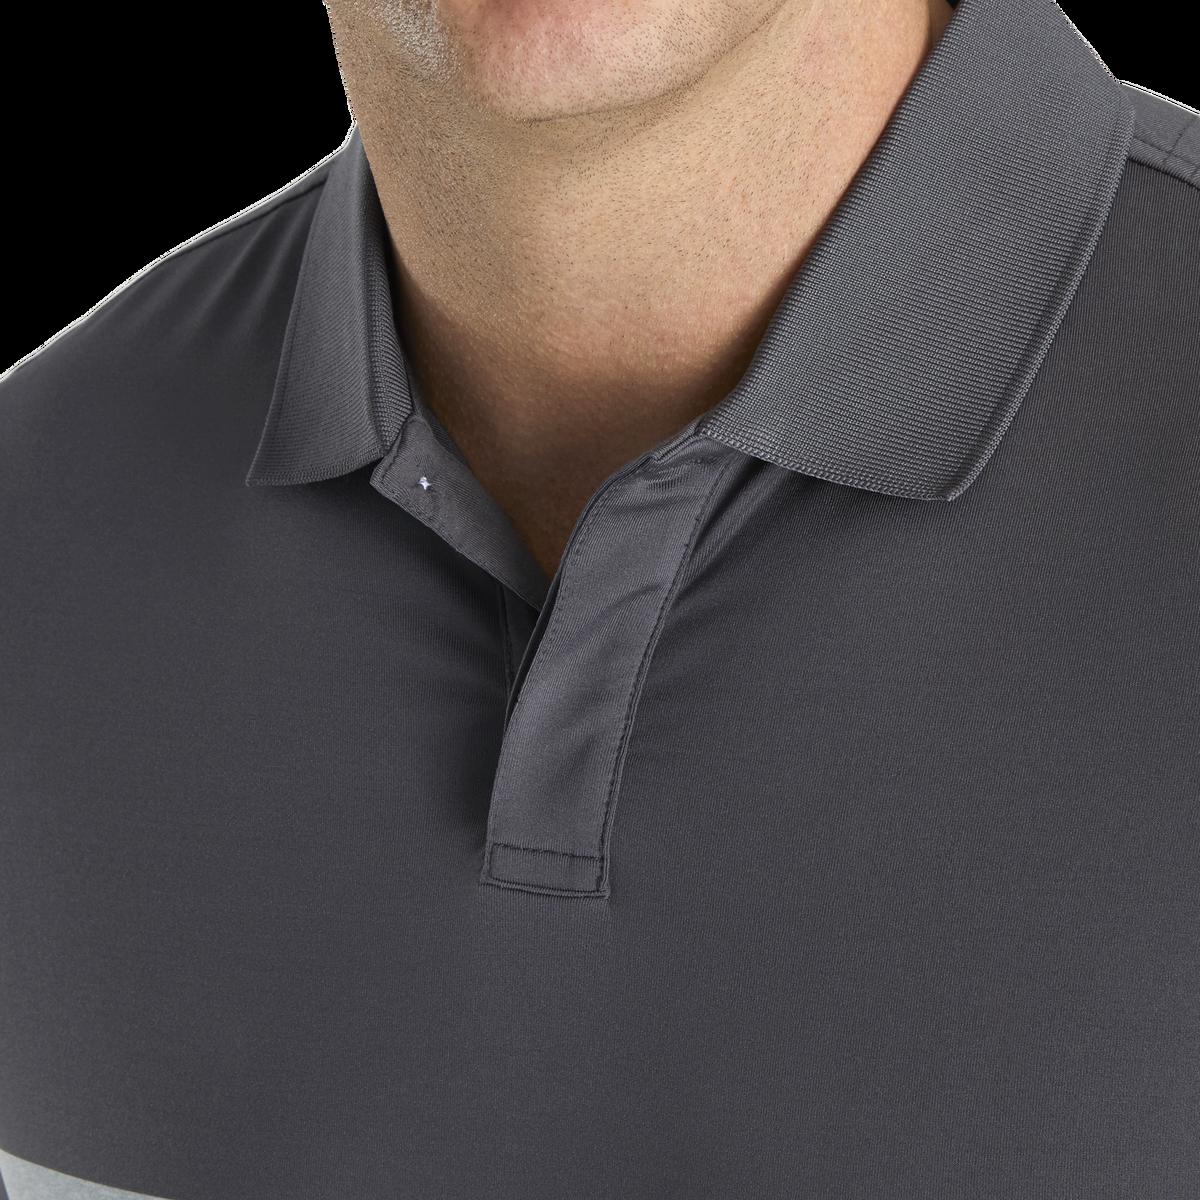 Lisle Simple Block Knit Collar